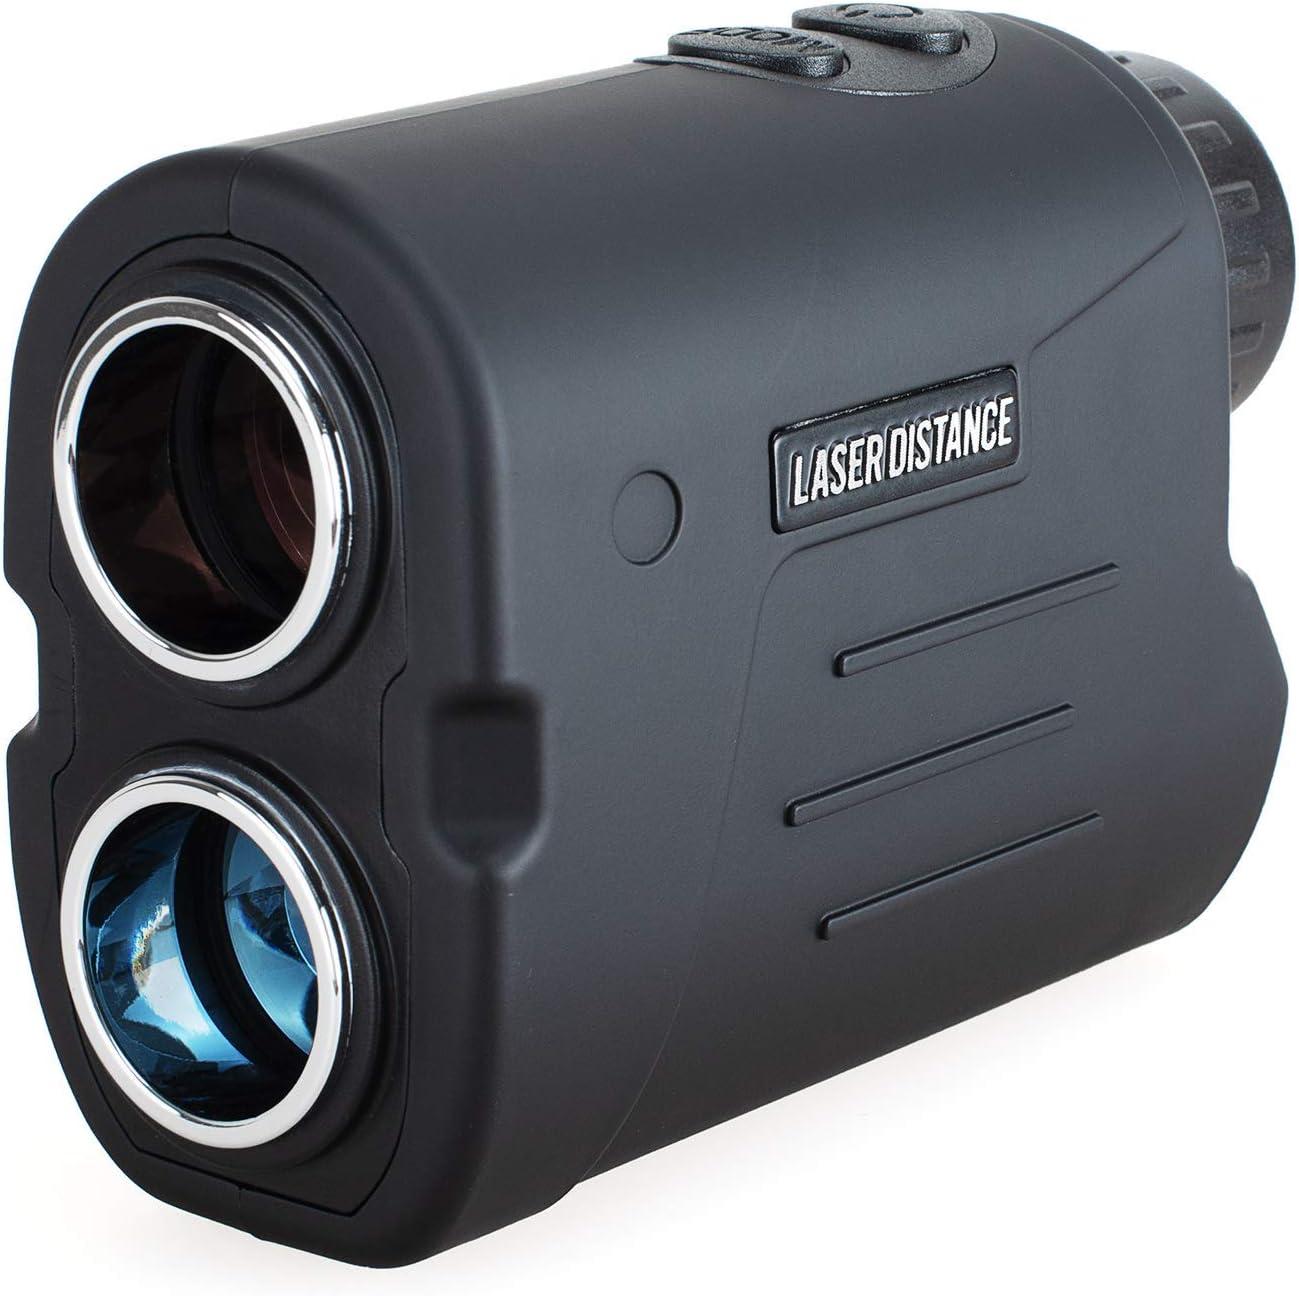 Gogogo Sport Laser Golf//Hunting Rangefinder Renewed 6X Magnification Clear View 650//900 Yards Laser Range Finder Accurate Scan Slope Function Pin-Seeker /& Flag-Lock /& Vibration Easy-to-Use Range Finder